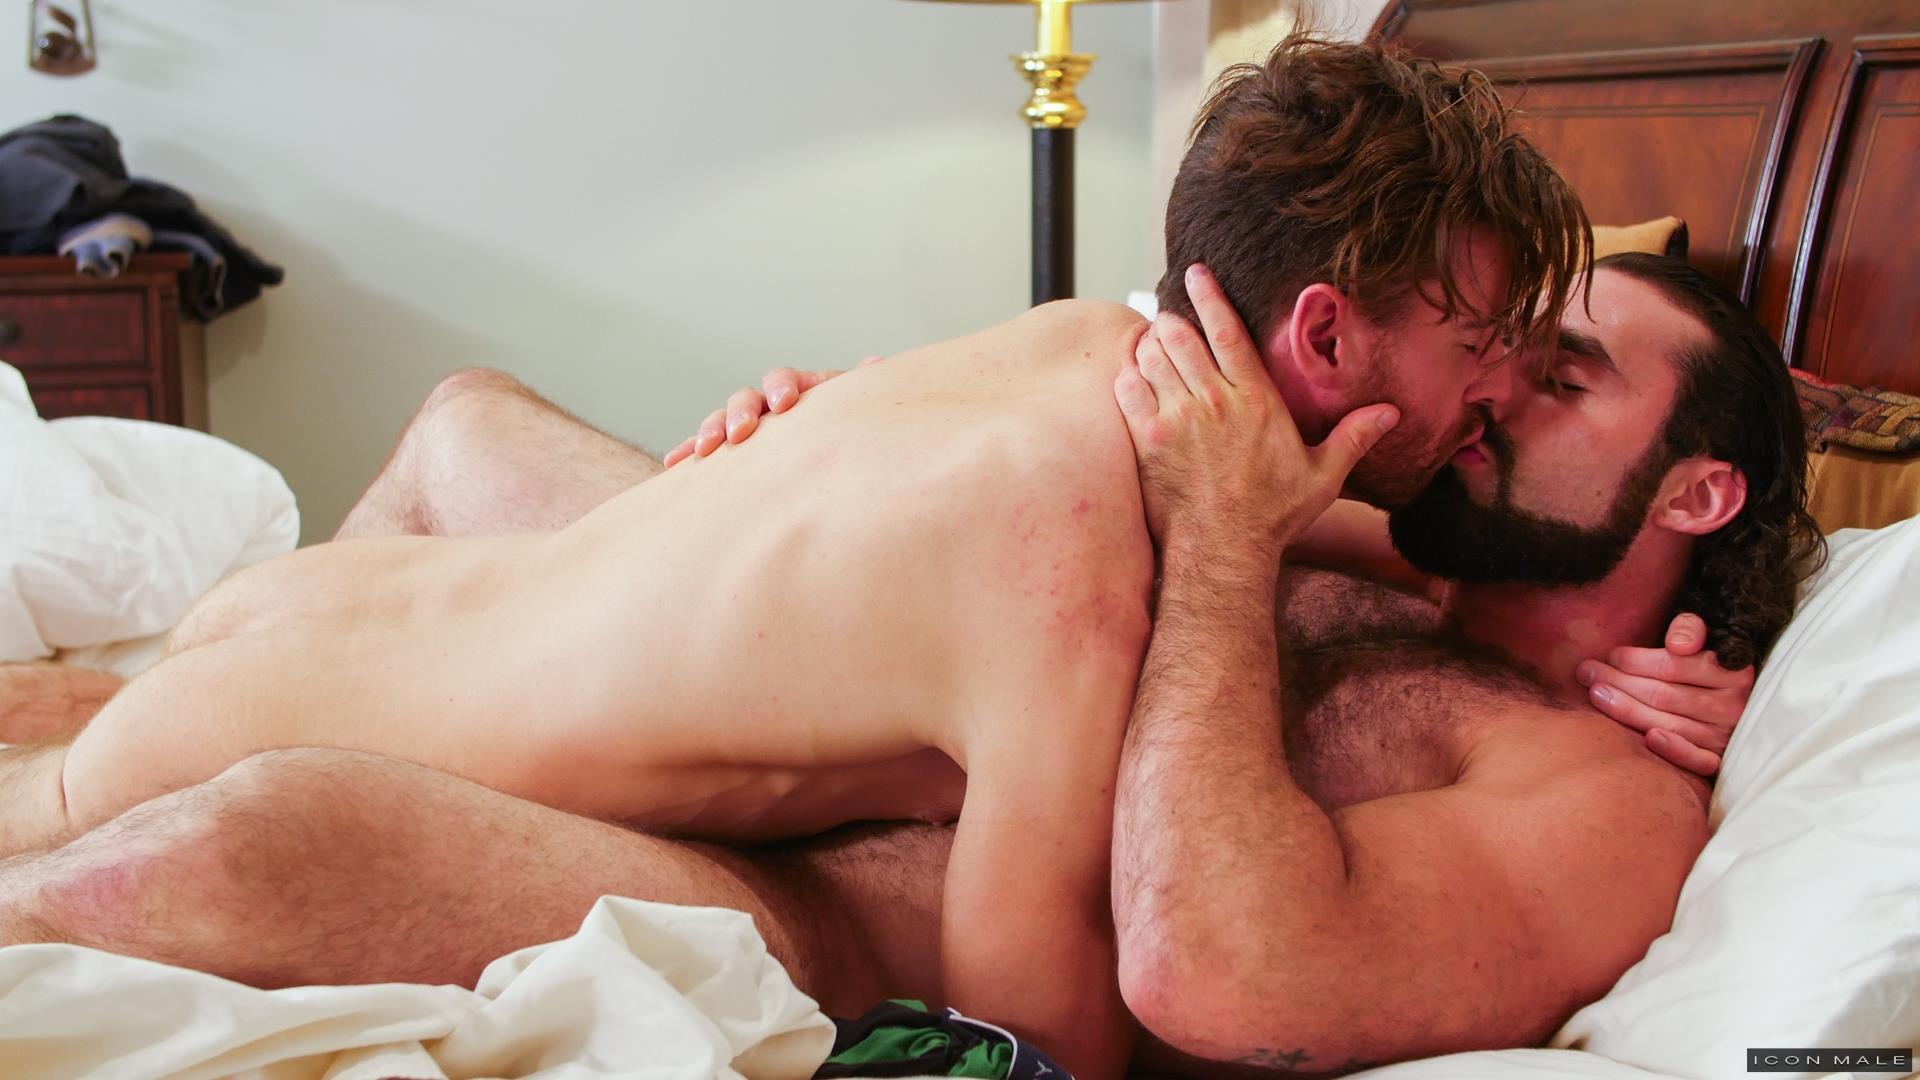 Icon-Male-Brendan-Patrick-and-Jaxton-Wheeler-Hairy-Muscle-Hunk-Fuck-Amateur-Gay-Porn-06 Straight Boy Brendan Patrick Gets Fucked By Hairy Muscle Hunk Jaxton Wheeler